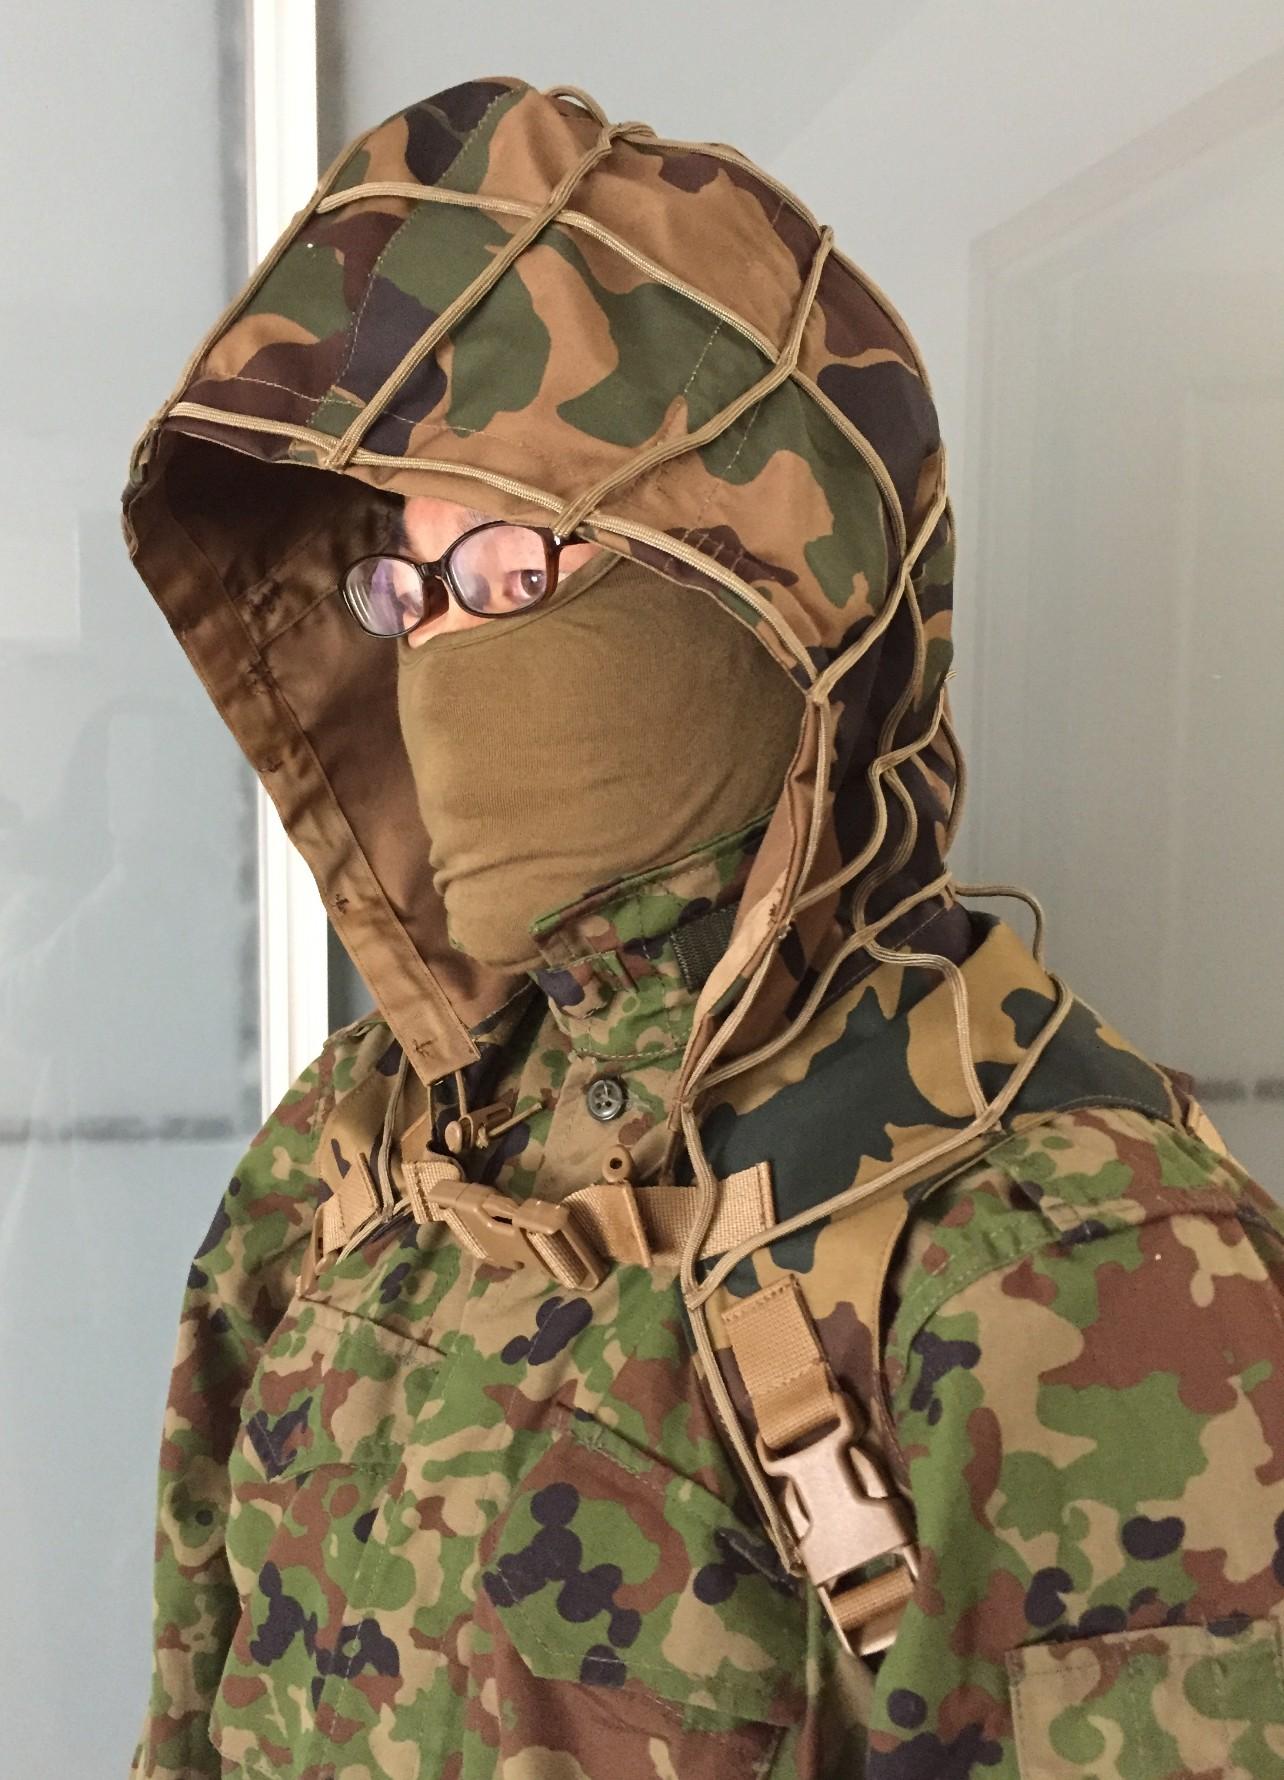 Sukerucom南蛮堂コラボ商品 SDF Tactical Alone Hood タクティカルアローンフード パラコード版 限定色陸自FTC迷彩